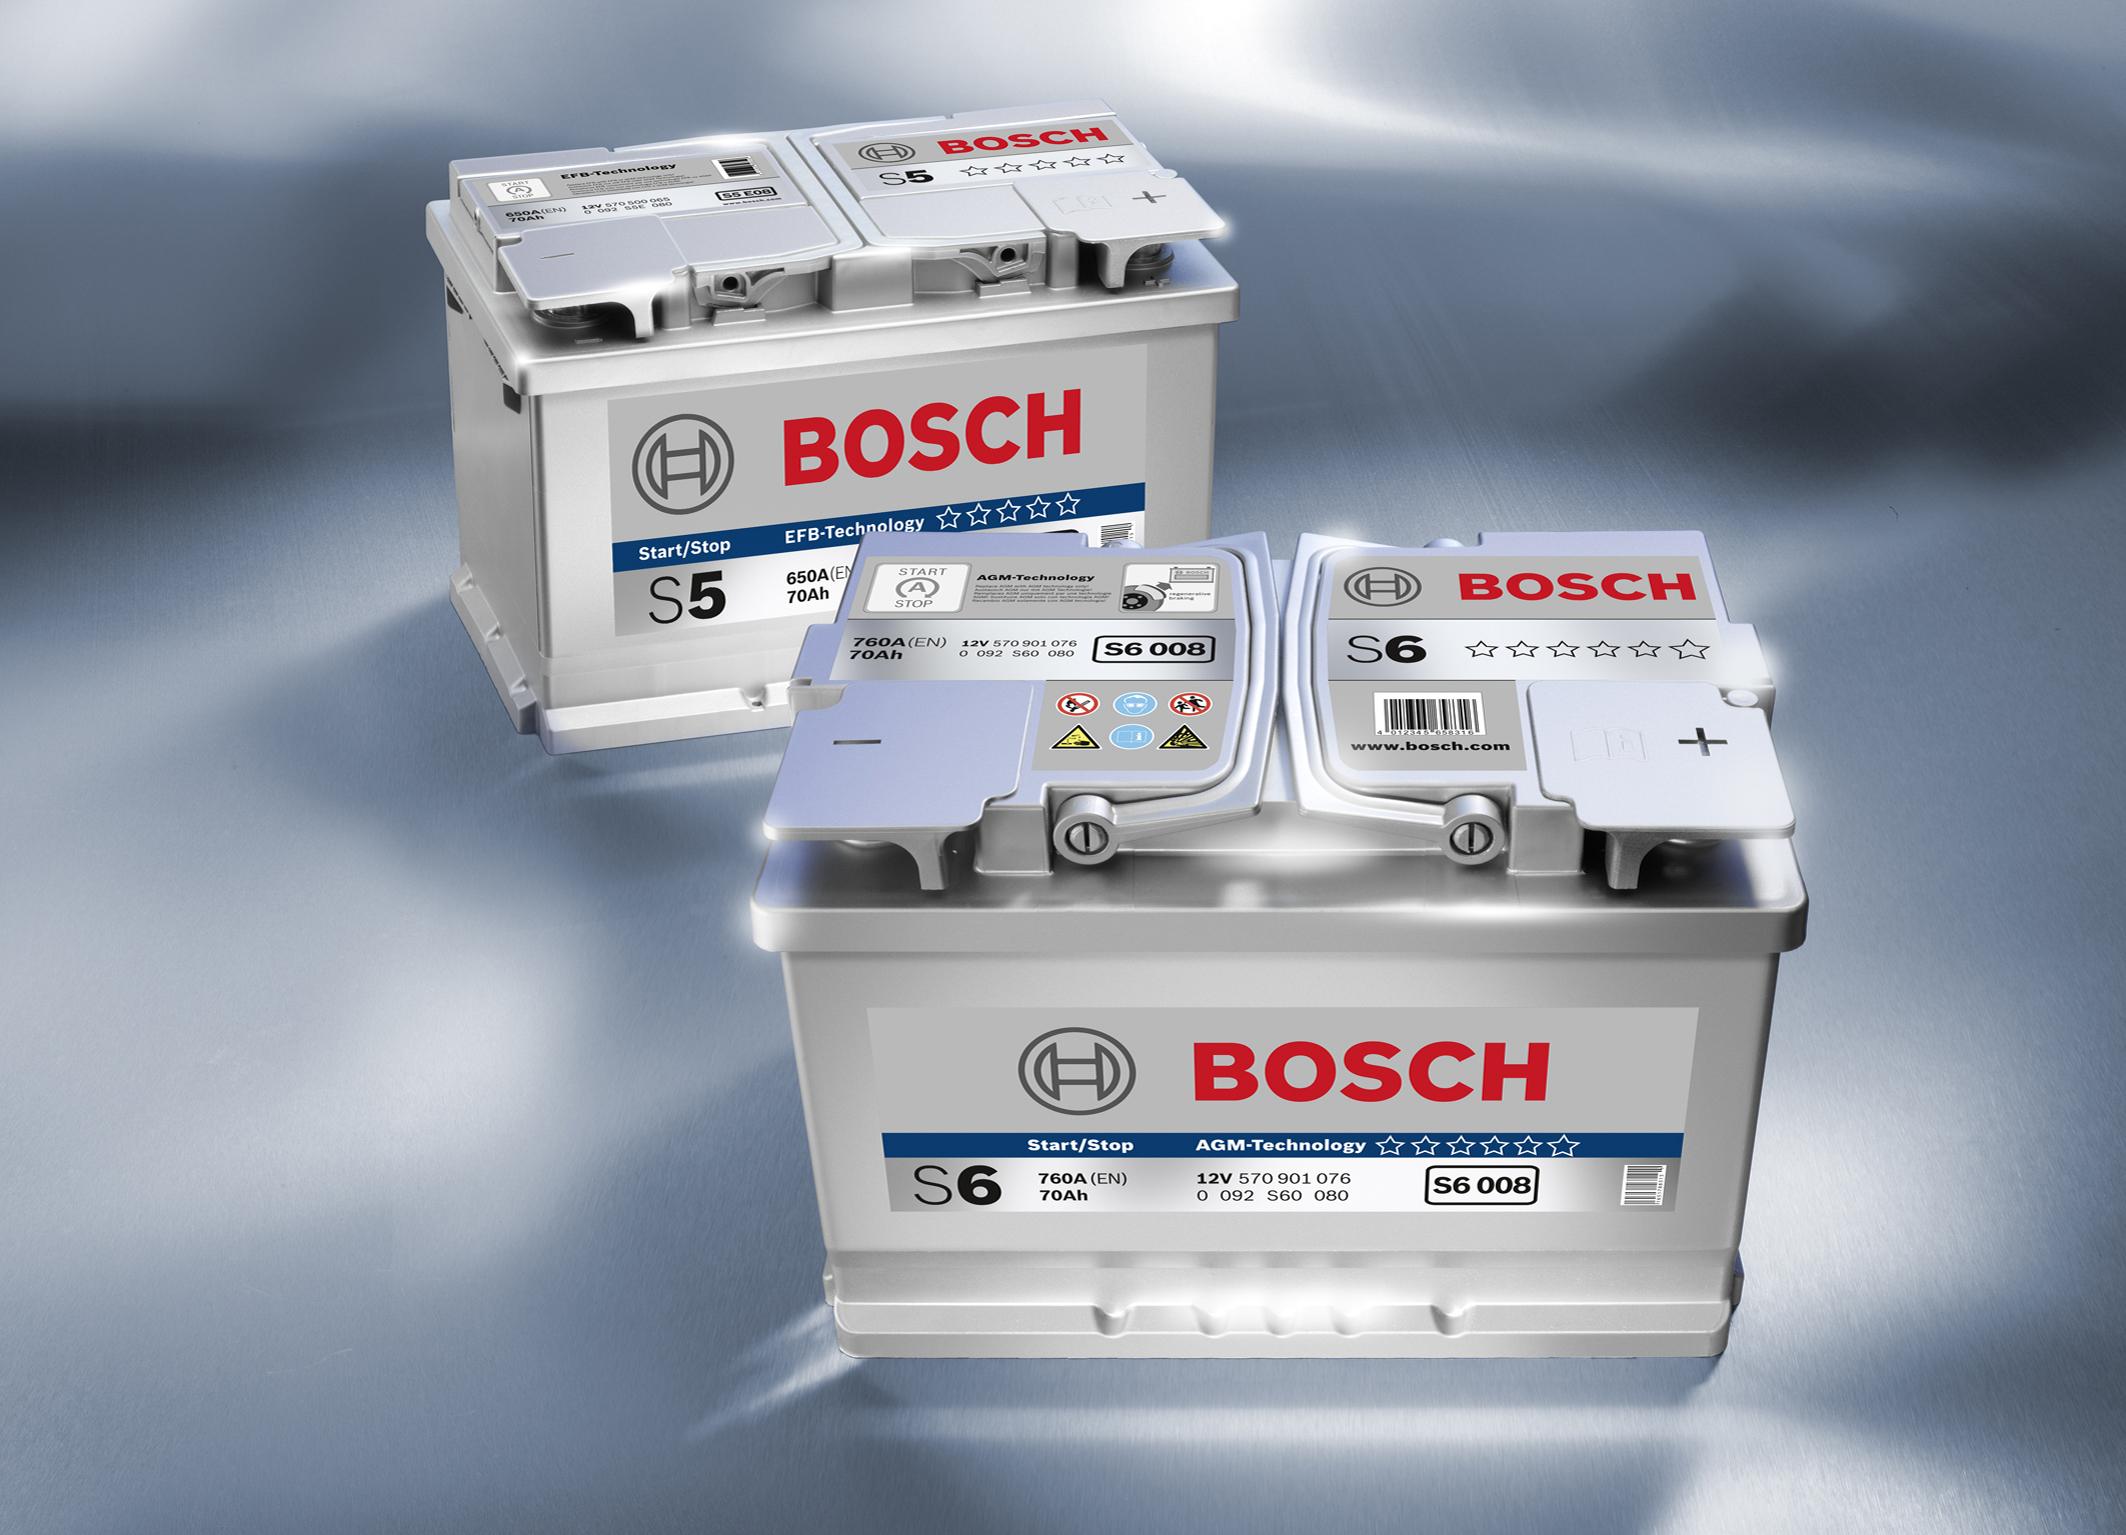 Bosch spare parts